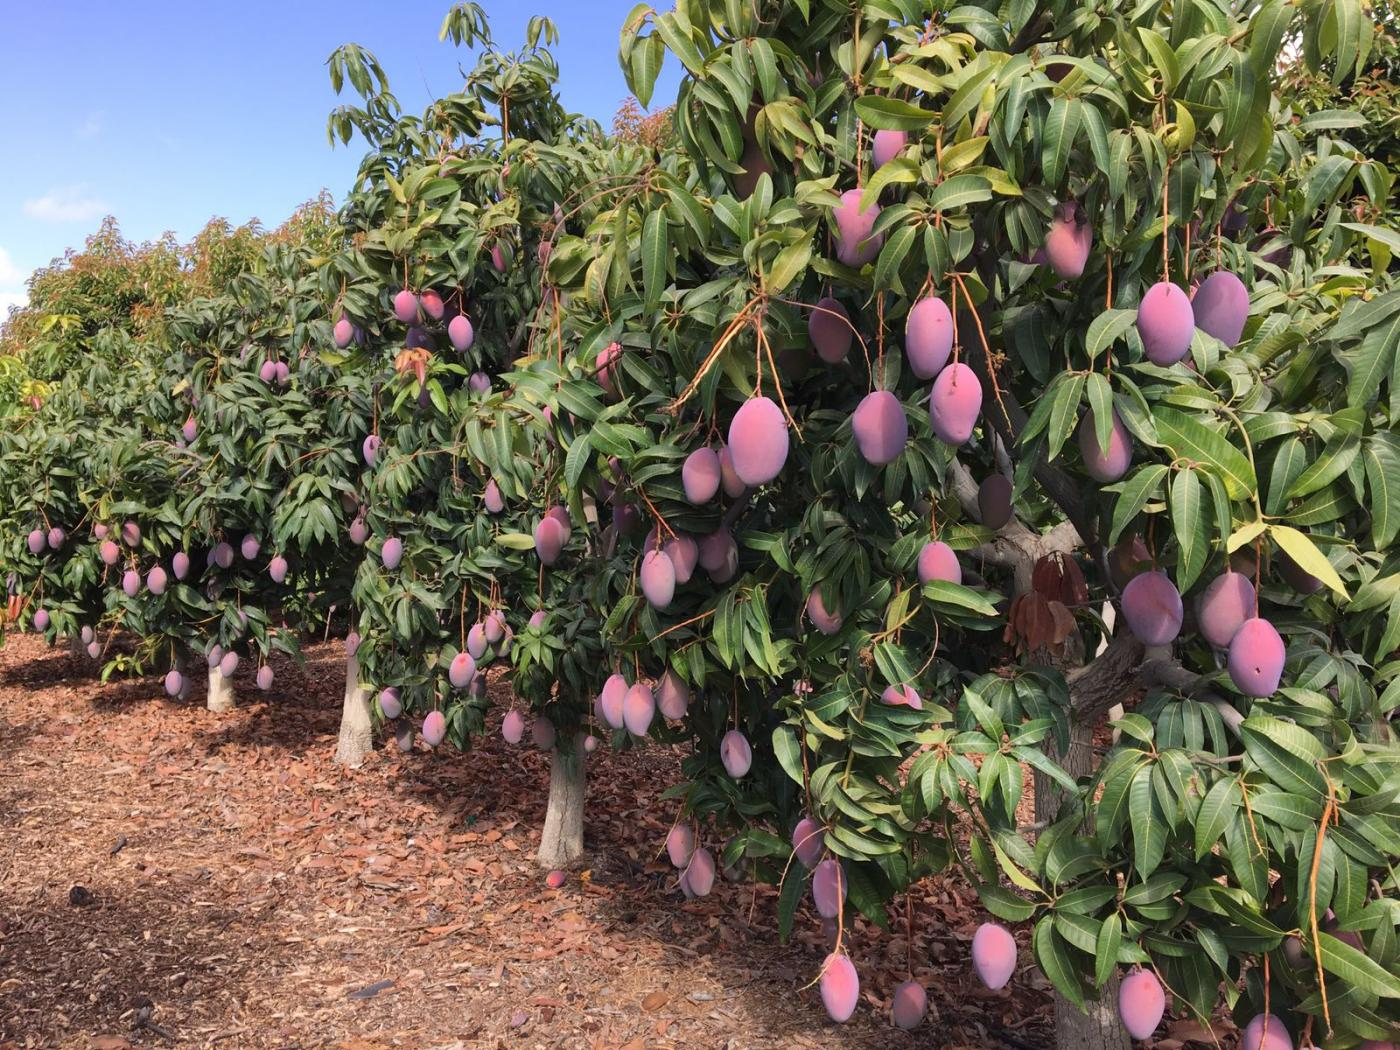 Detenida por robar 2.500 kilos de mangos en Salobreña